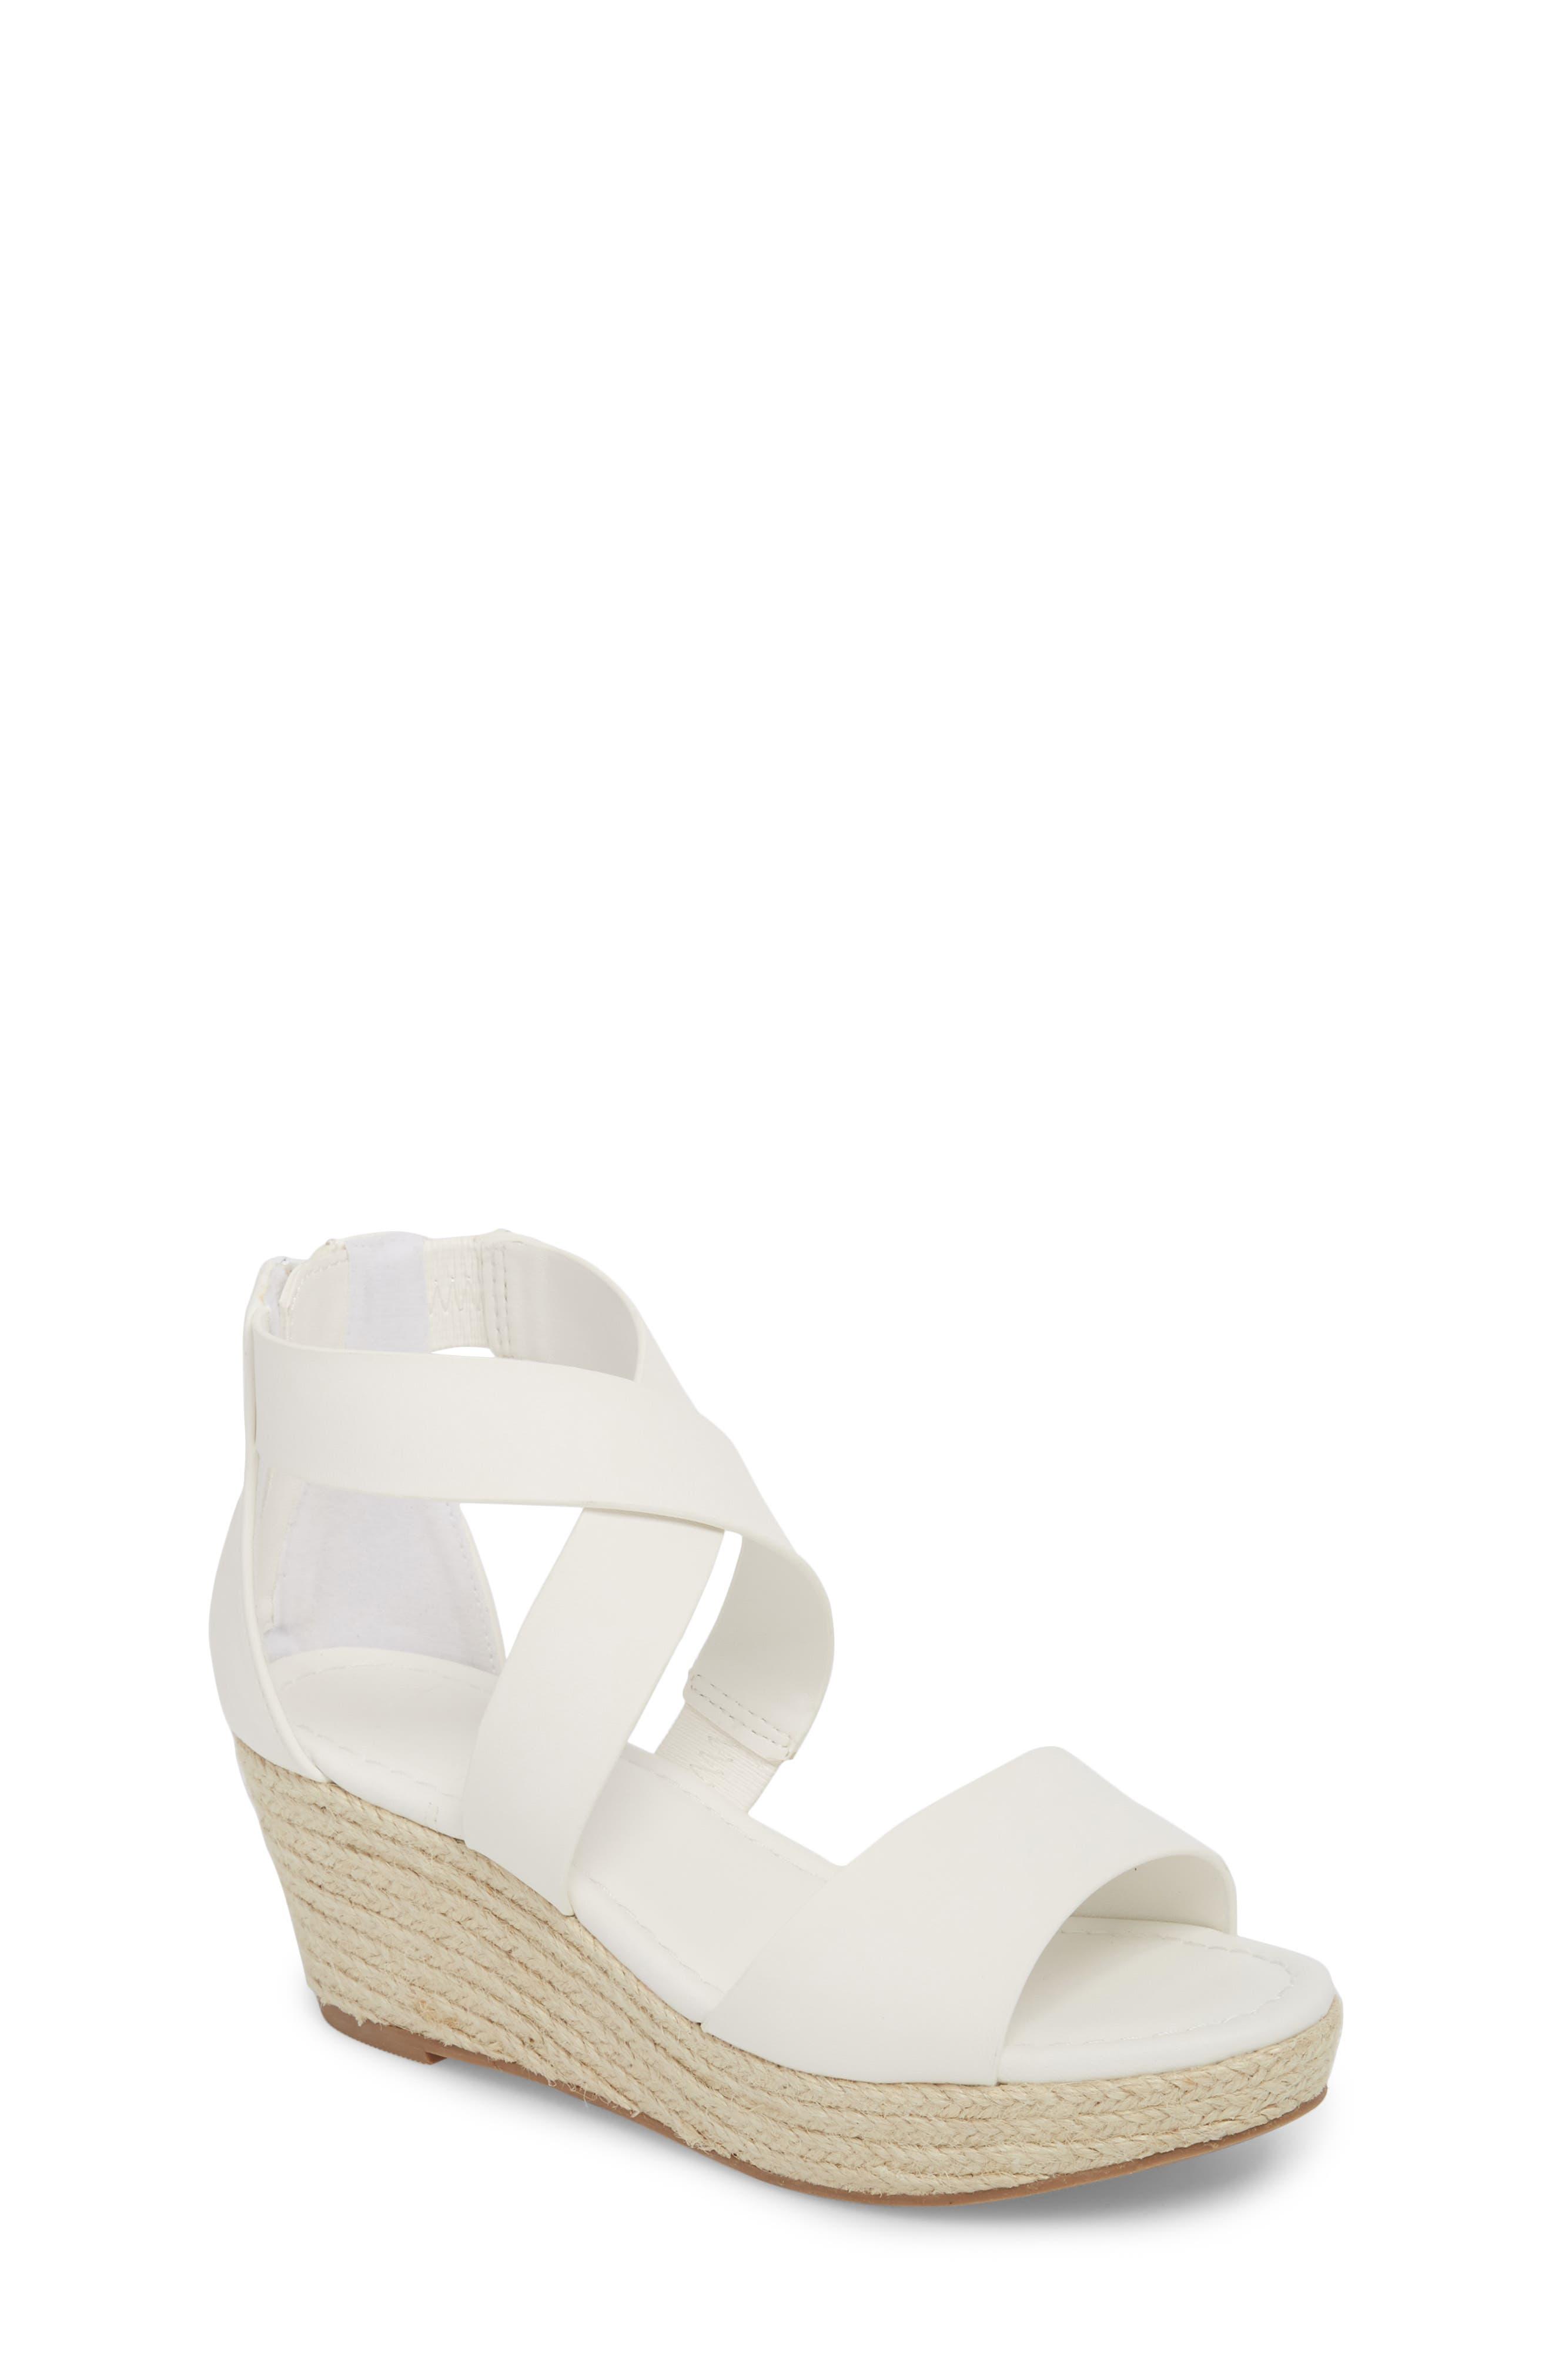 Wilma Platform Wedge Sandal,                             Main thumbnail 1, color,                             White